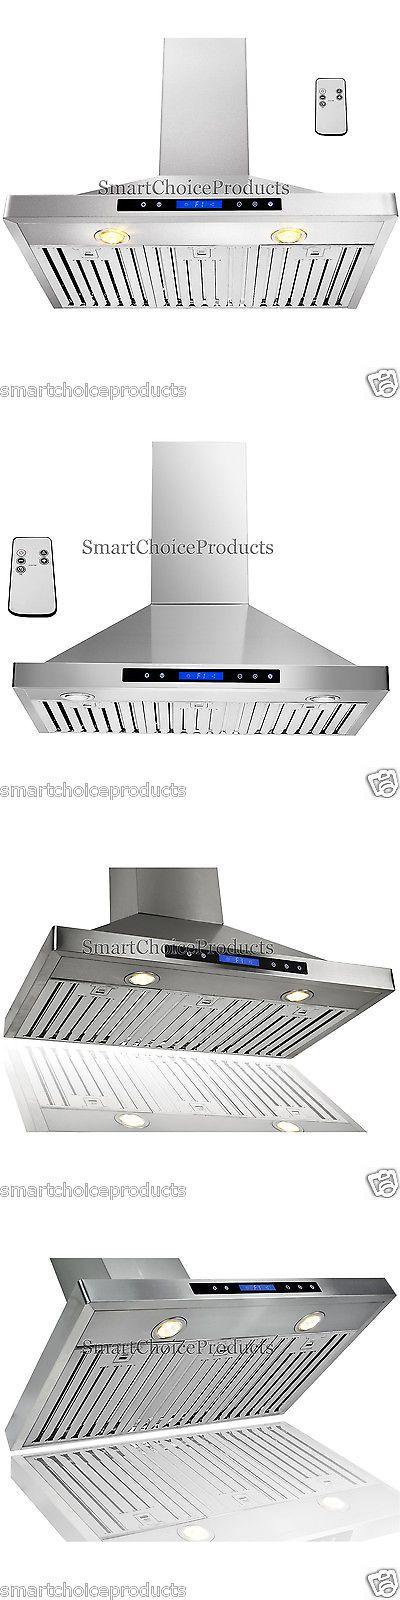 Range Hoods 71253: Gtc Europe 36 Kitchen Wall Mount Stainless Steel Range Hood Vent -> BUY IT NOW ONLY: $269.99 on eBay!